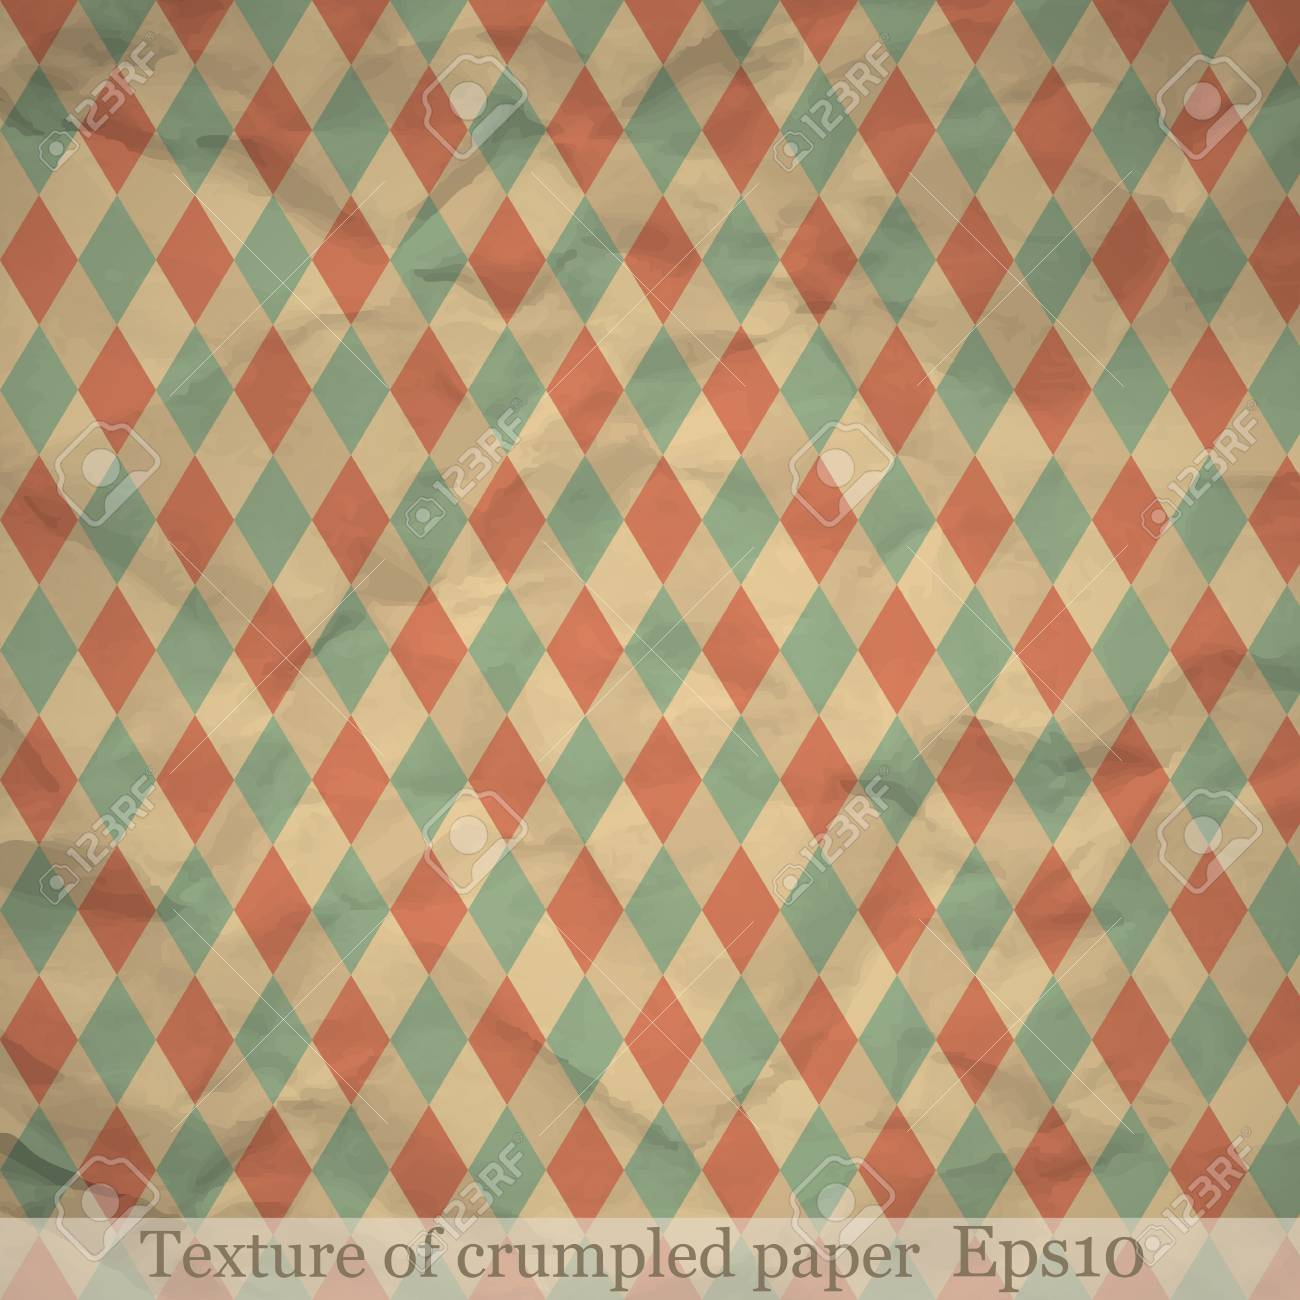 Texture of crumpled paper Stock Vector - 15788428